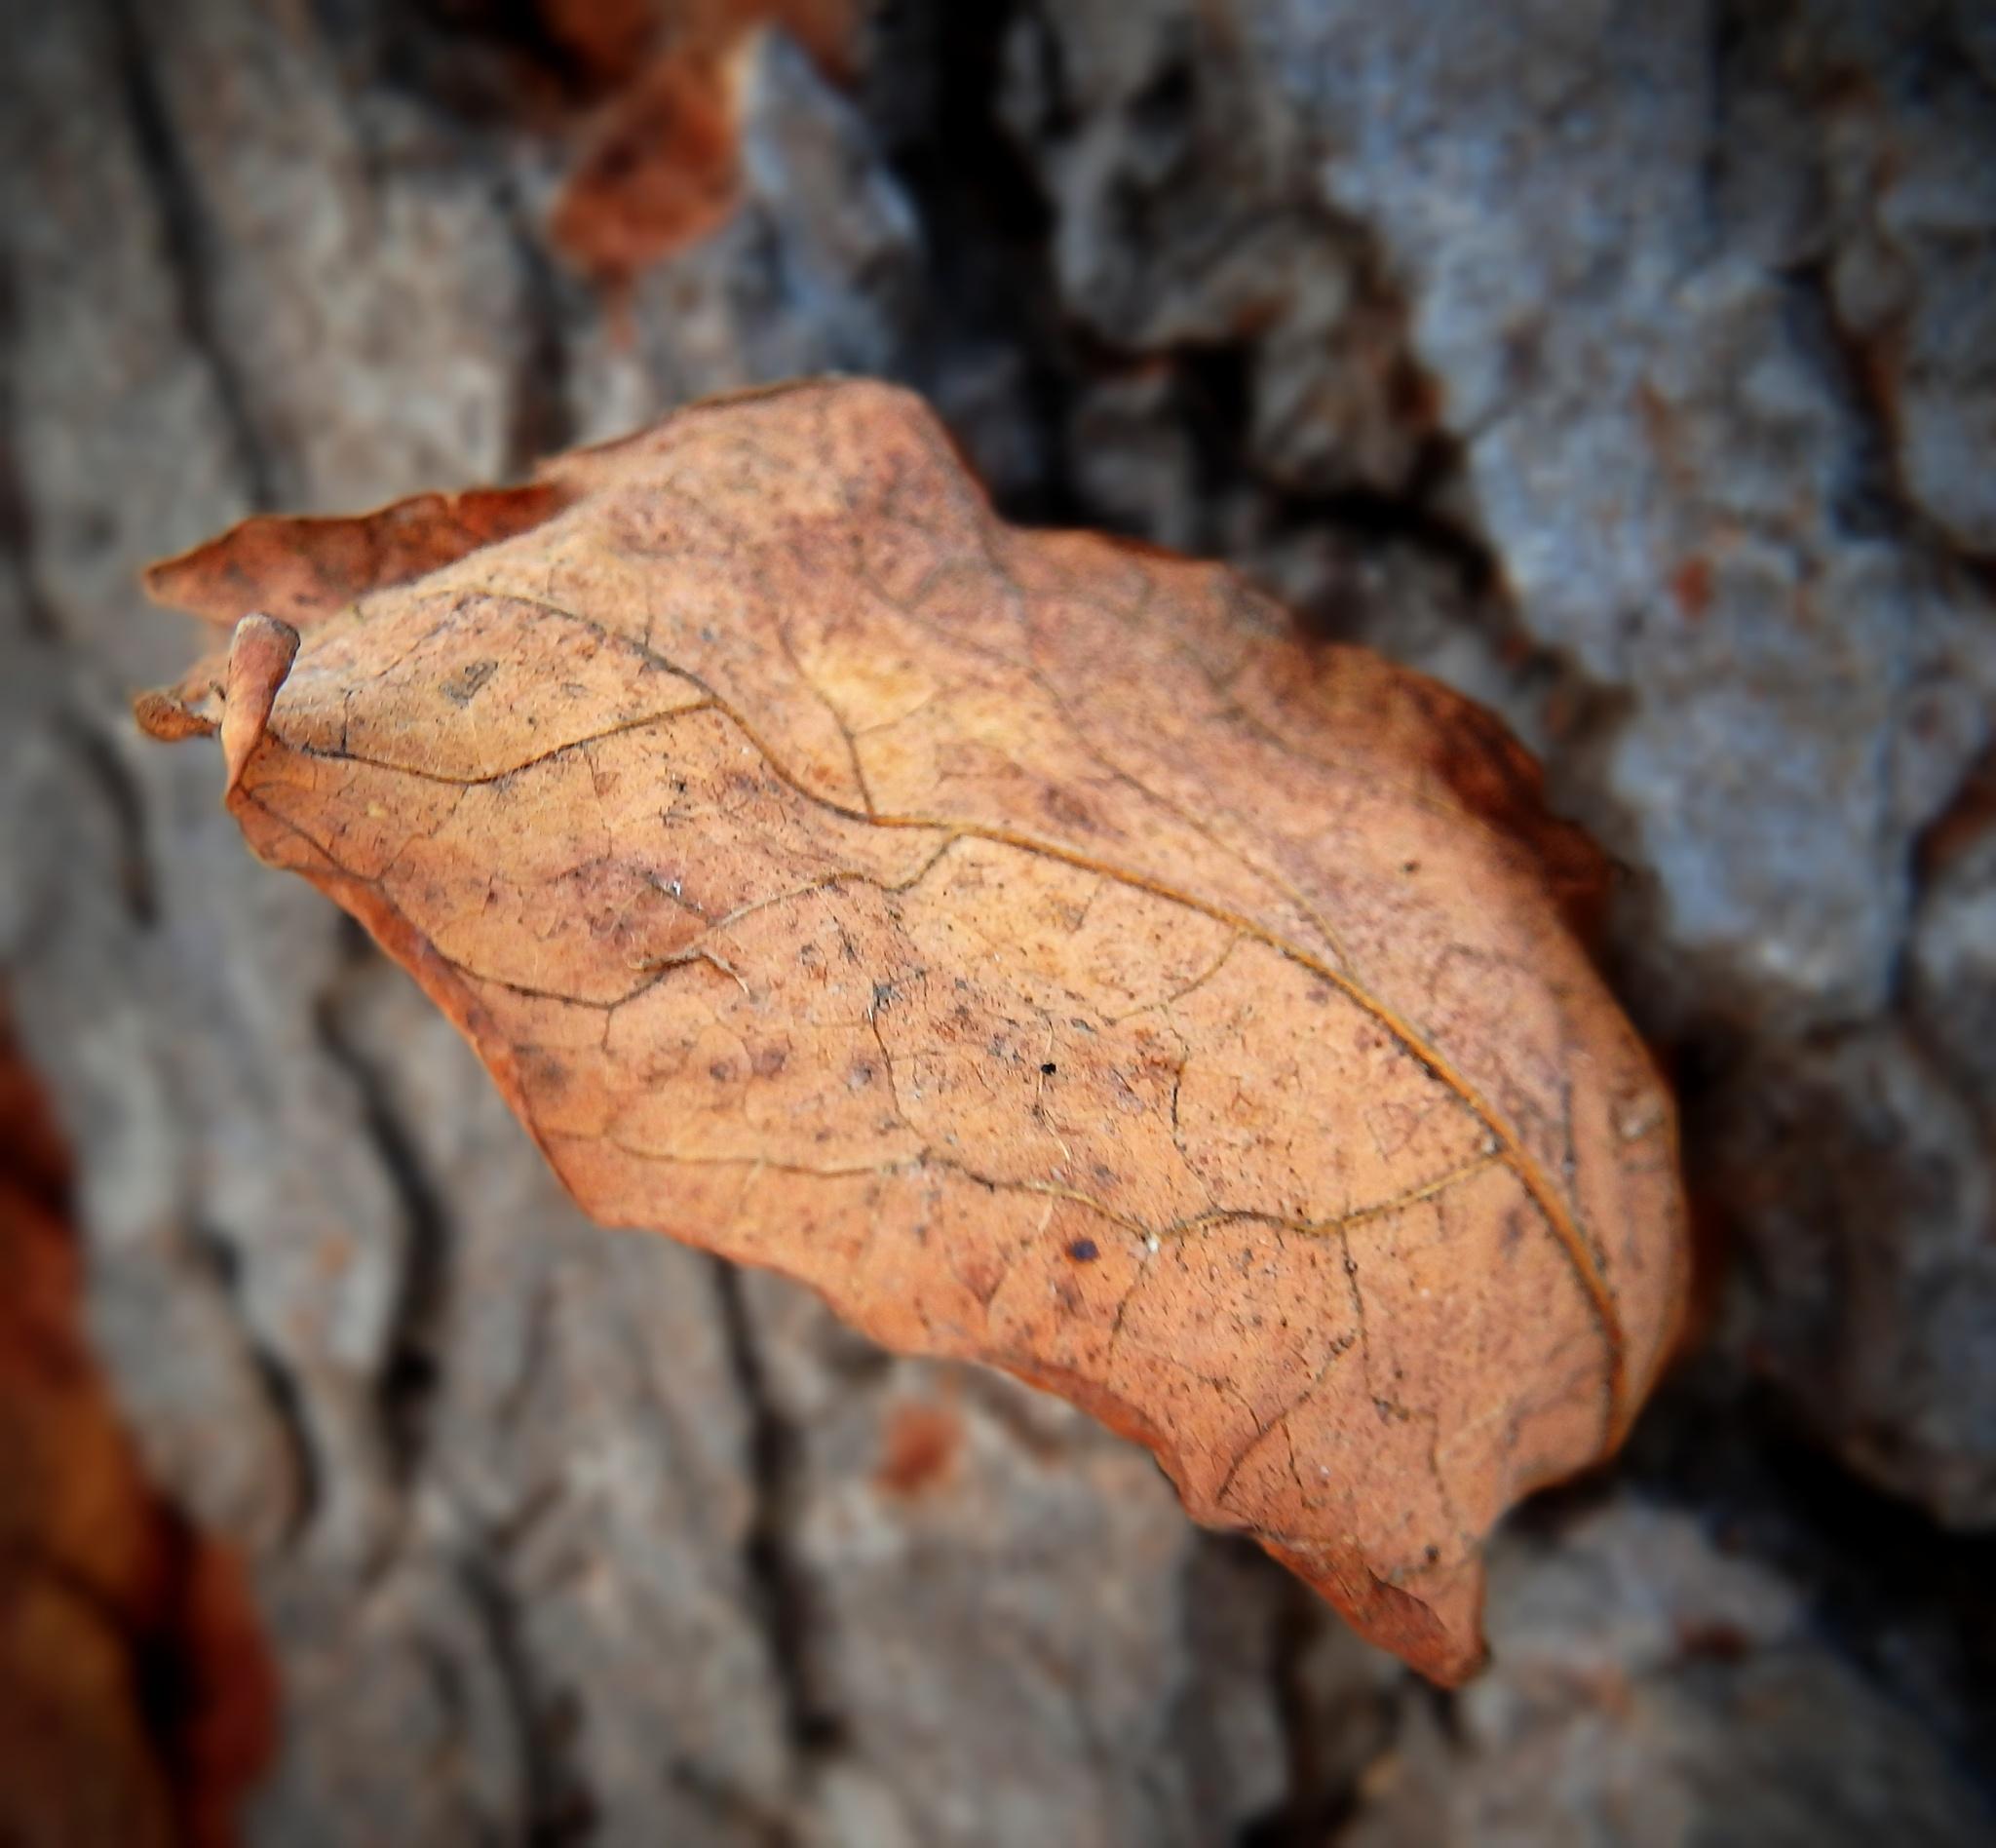 Fall Leaf Stuck On A Tree by Darlene Eastin